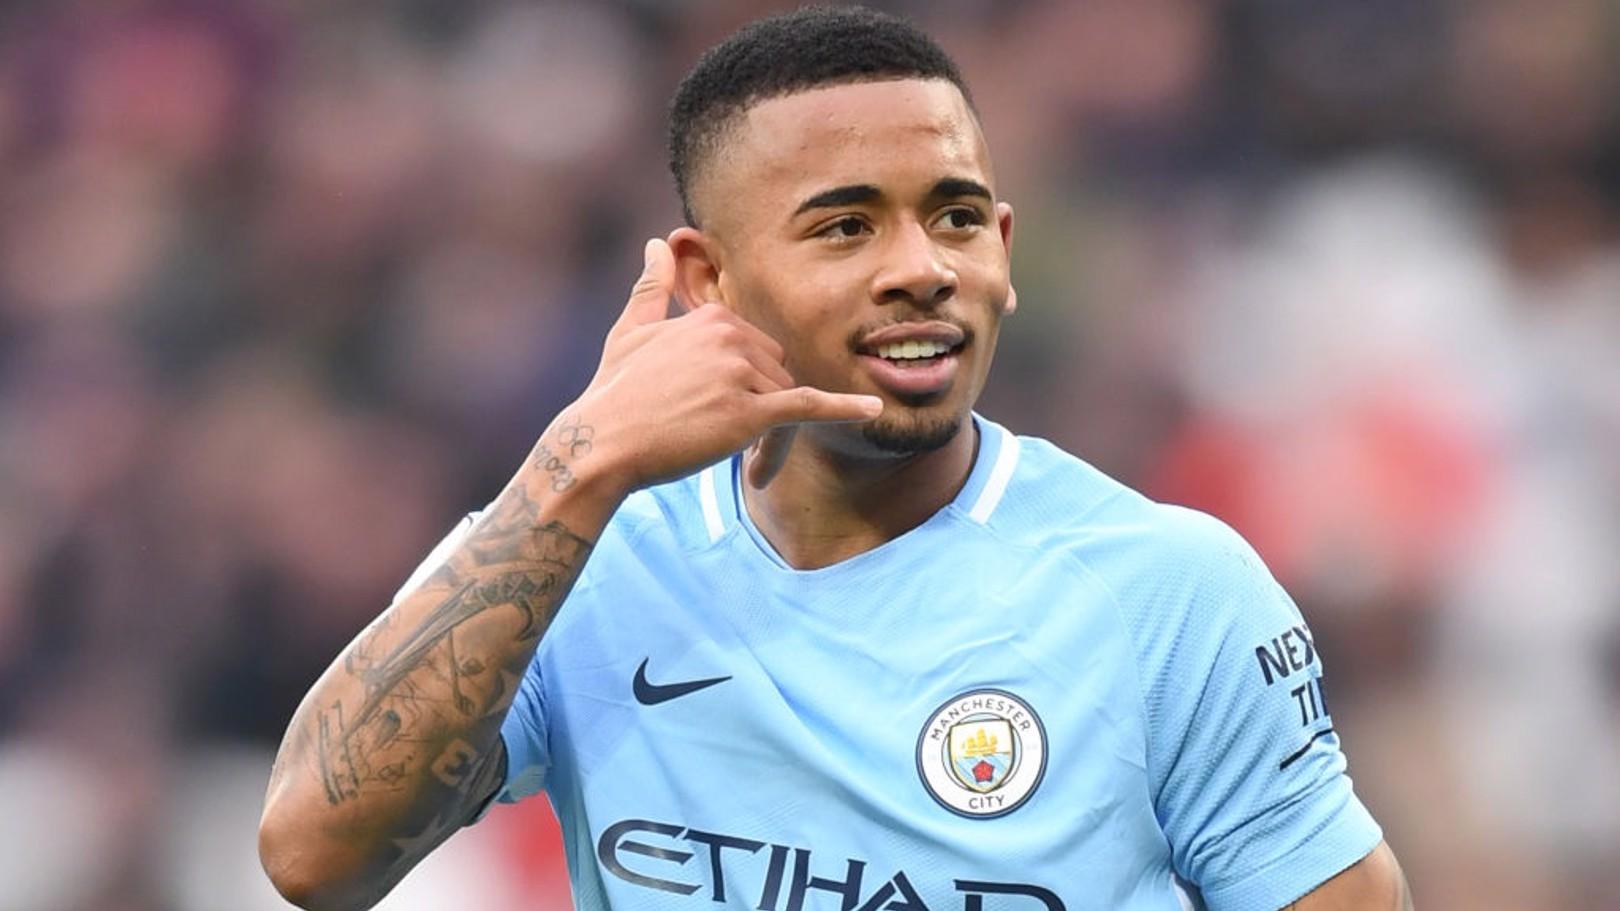 DREAM: Gabriel Jesus has enjoyed his time at City so far